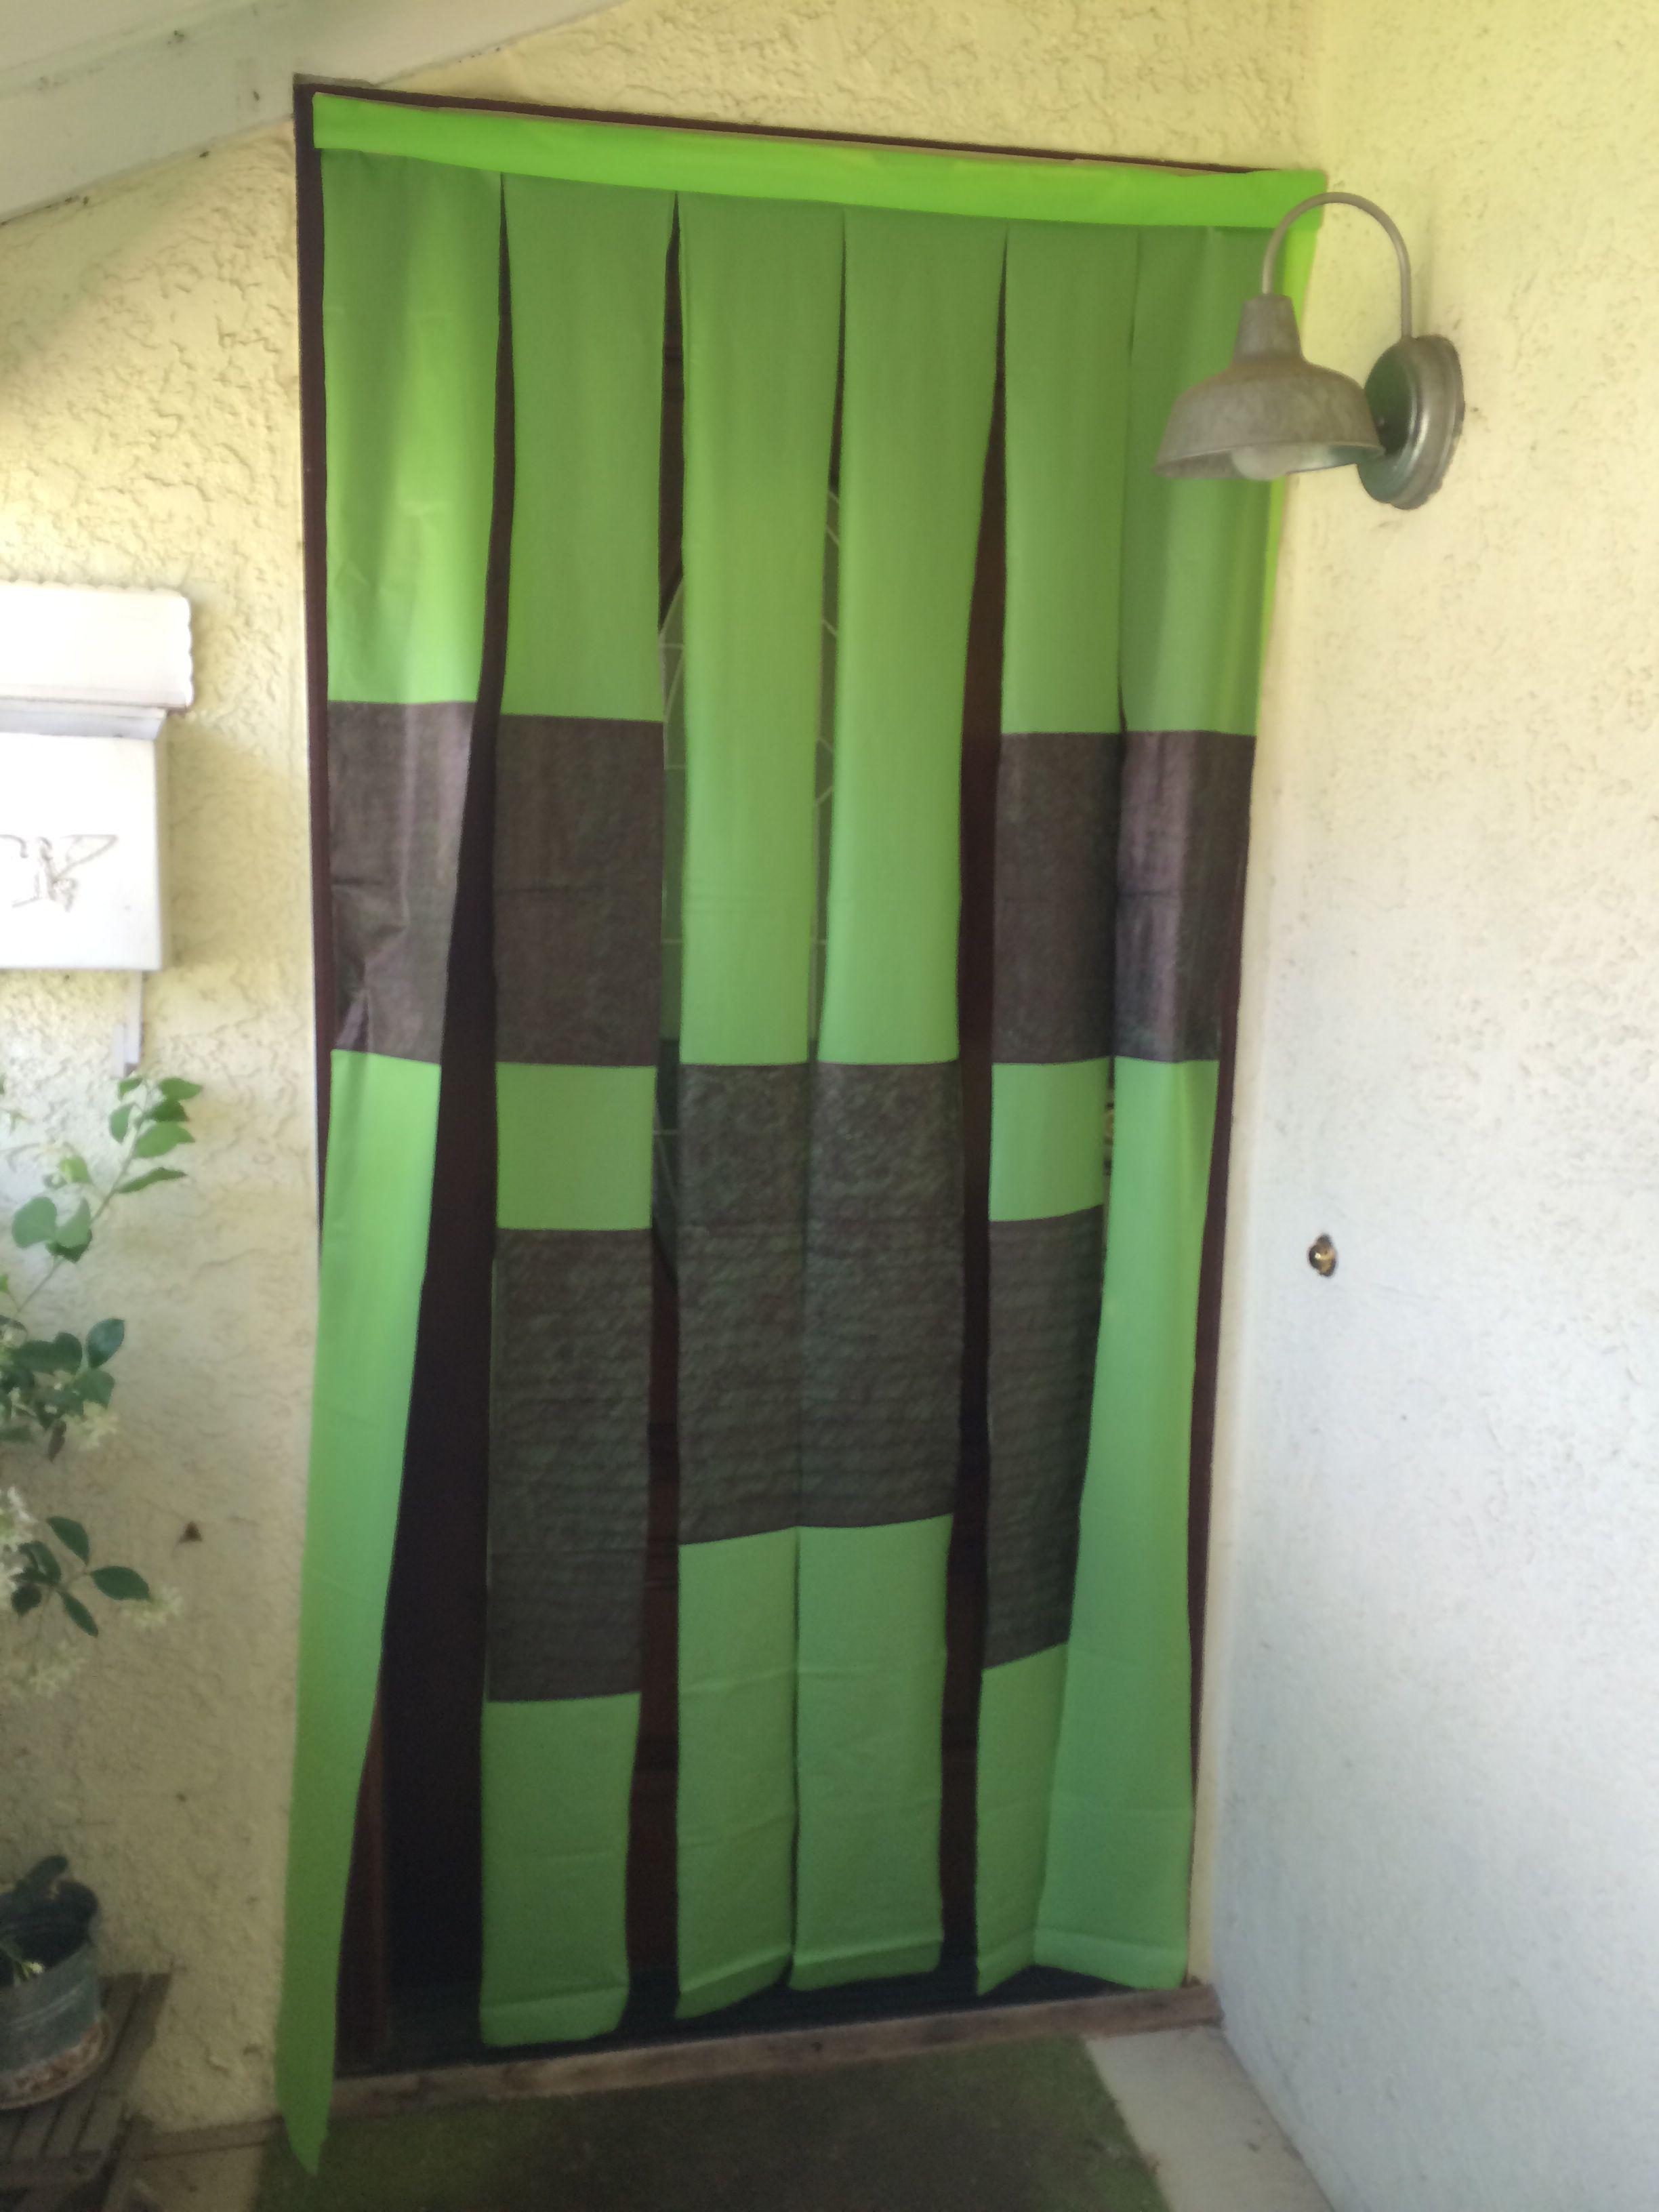 Minecraft Creeper Door Screen Lime Green Plastic Table Cloth